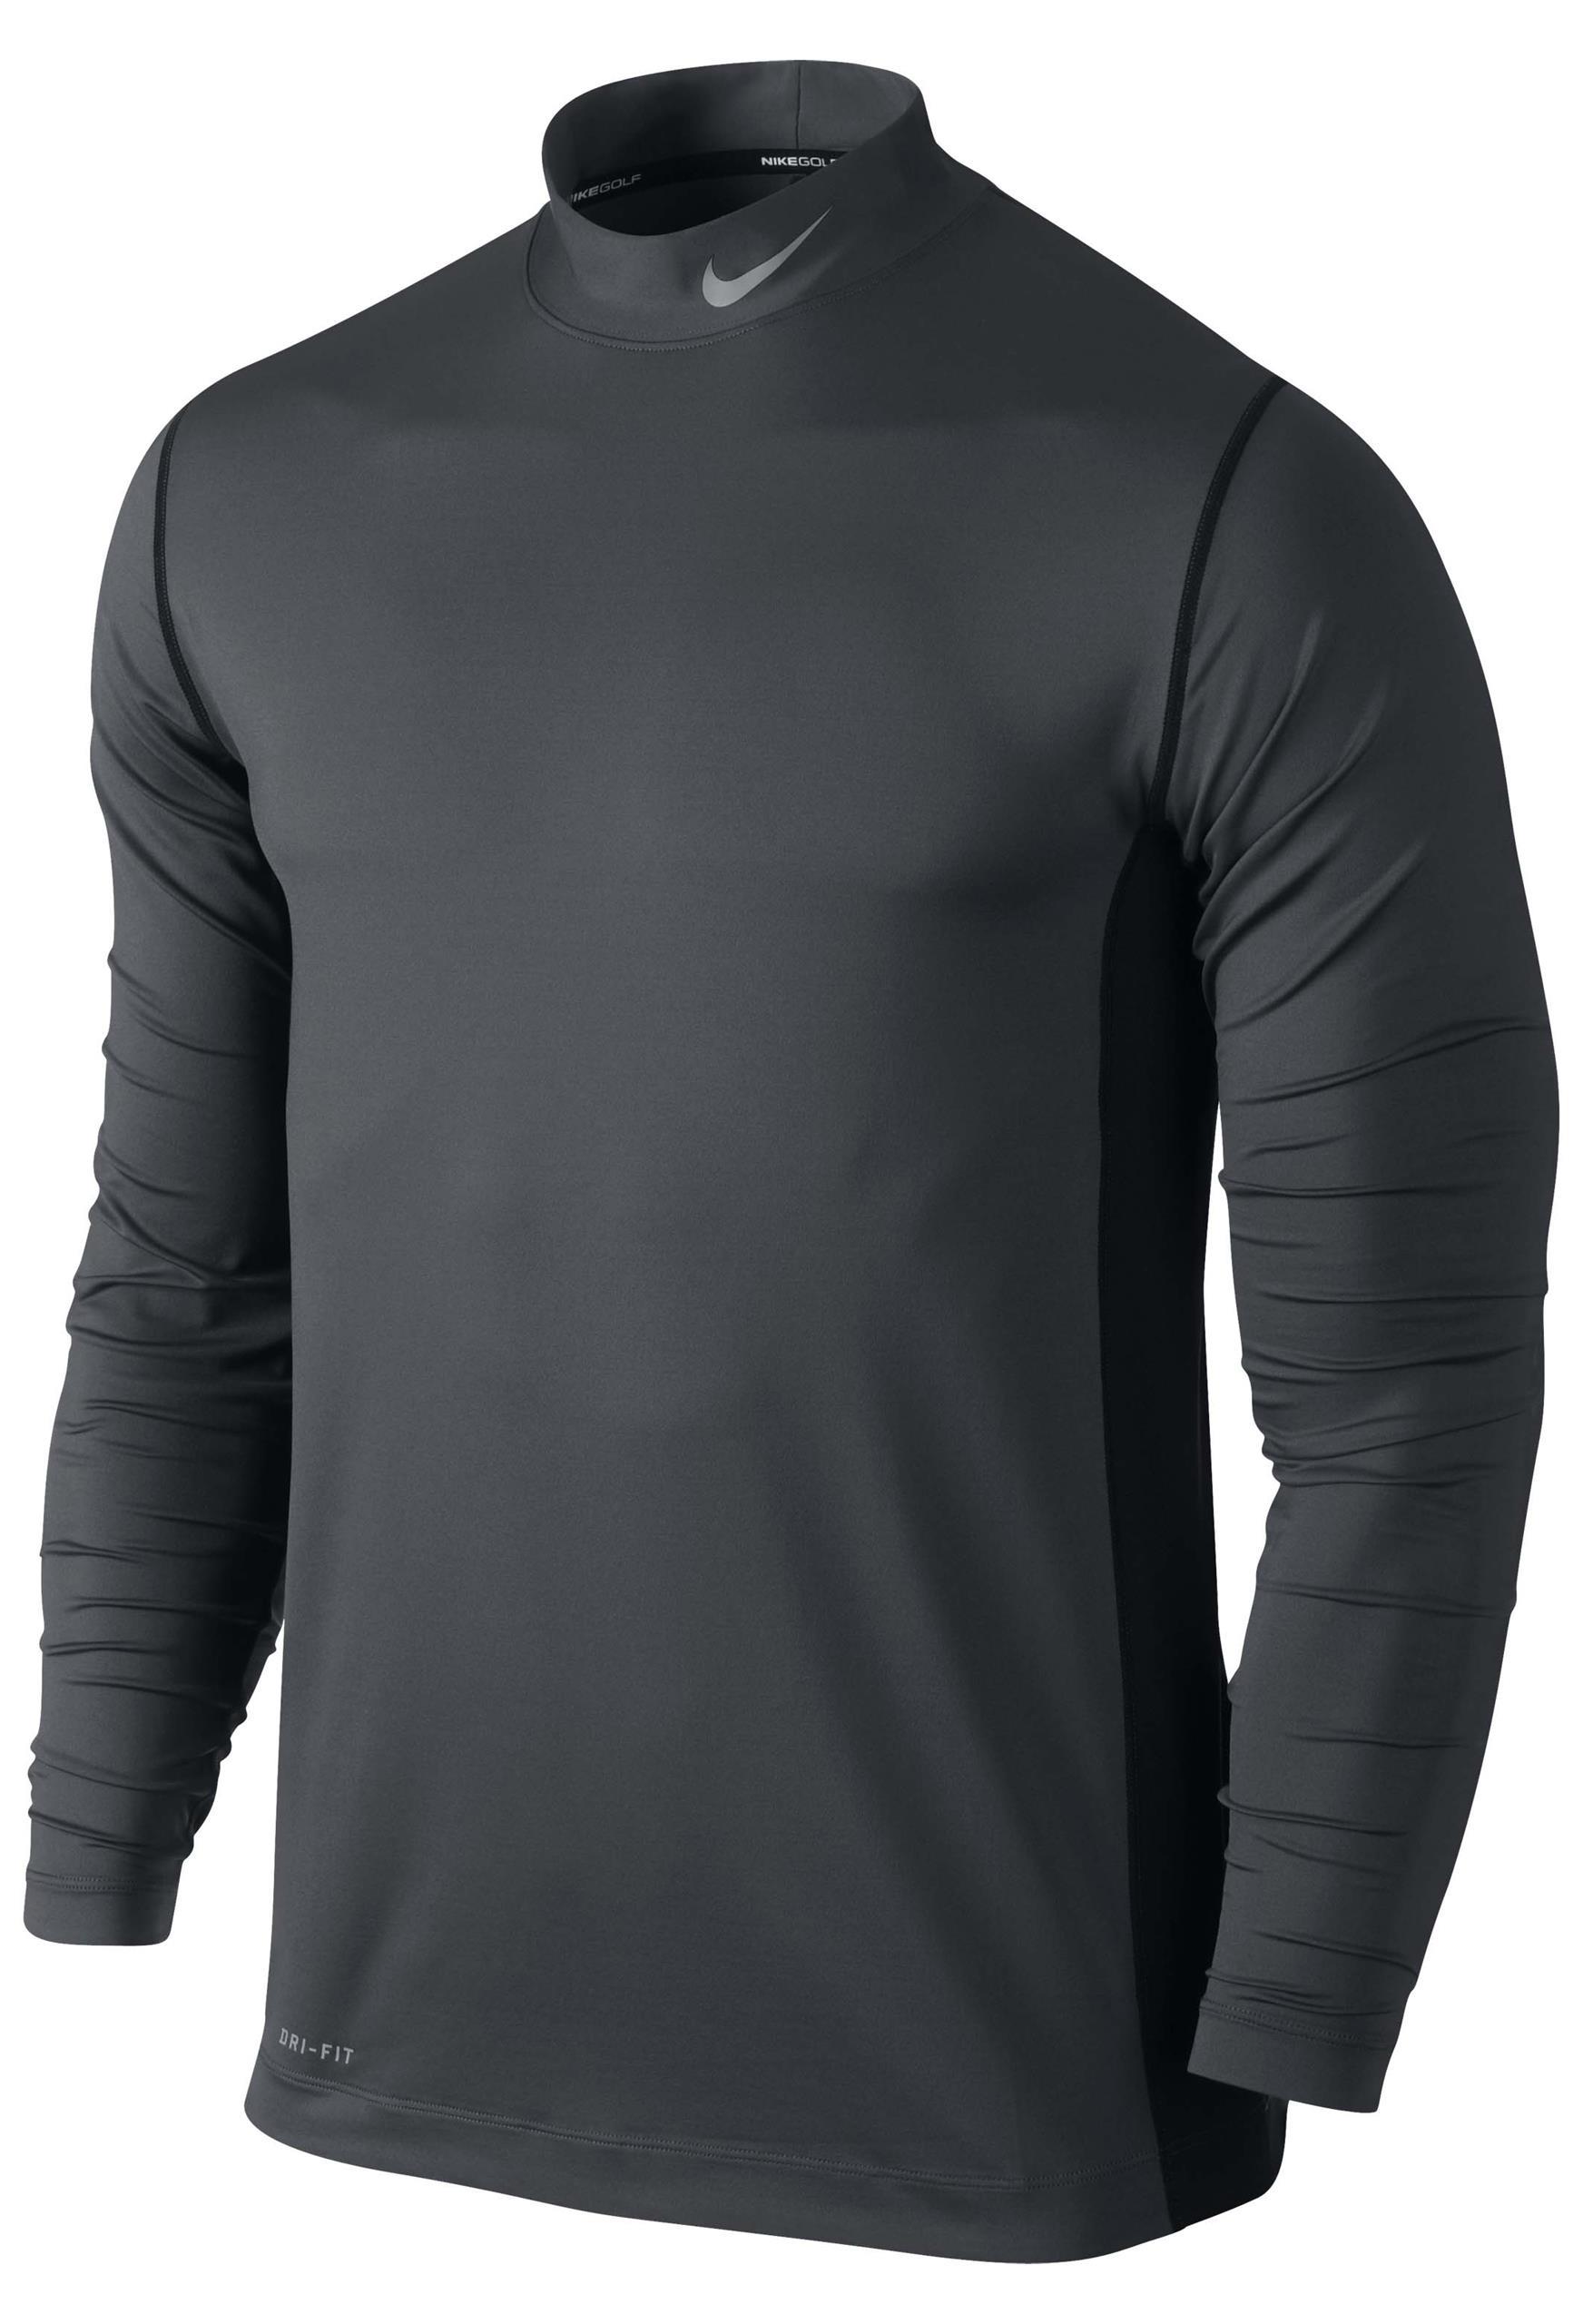 New Mens Nike Dri Fit High Neck Long Sleeved Lightweight